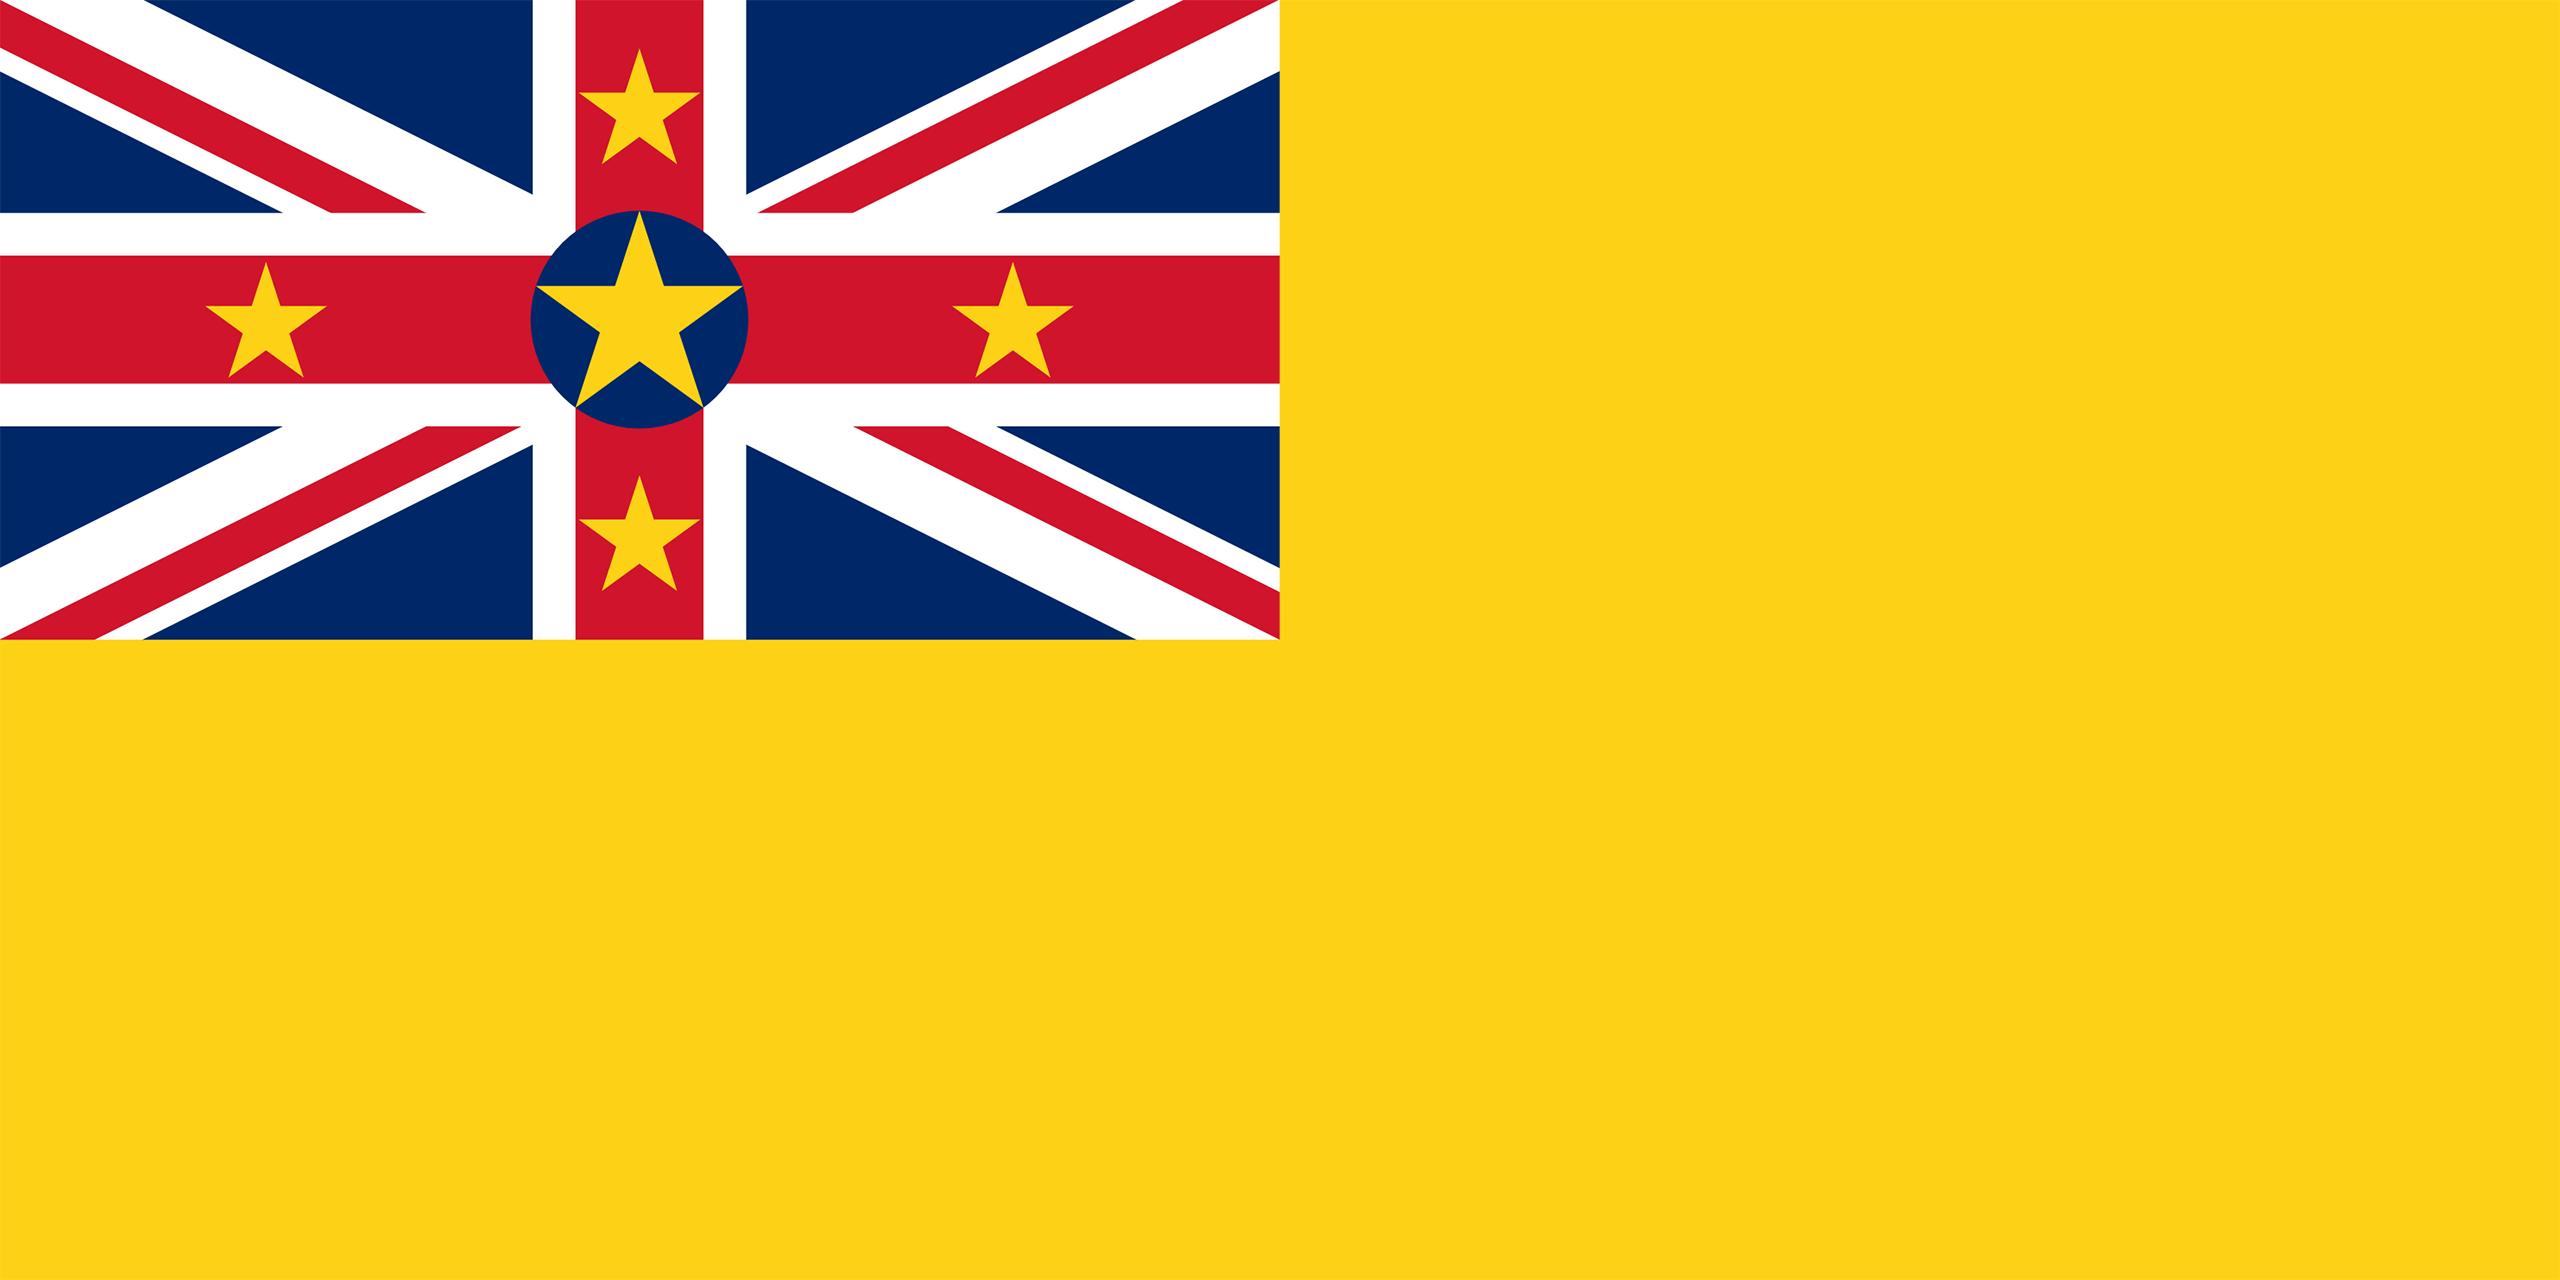 niue, страна, Эмблема, логотип, символ - Обои HD - Профессор falken.com